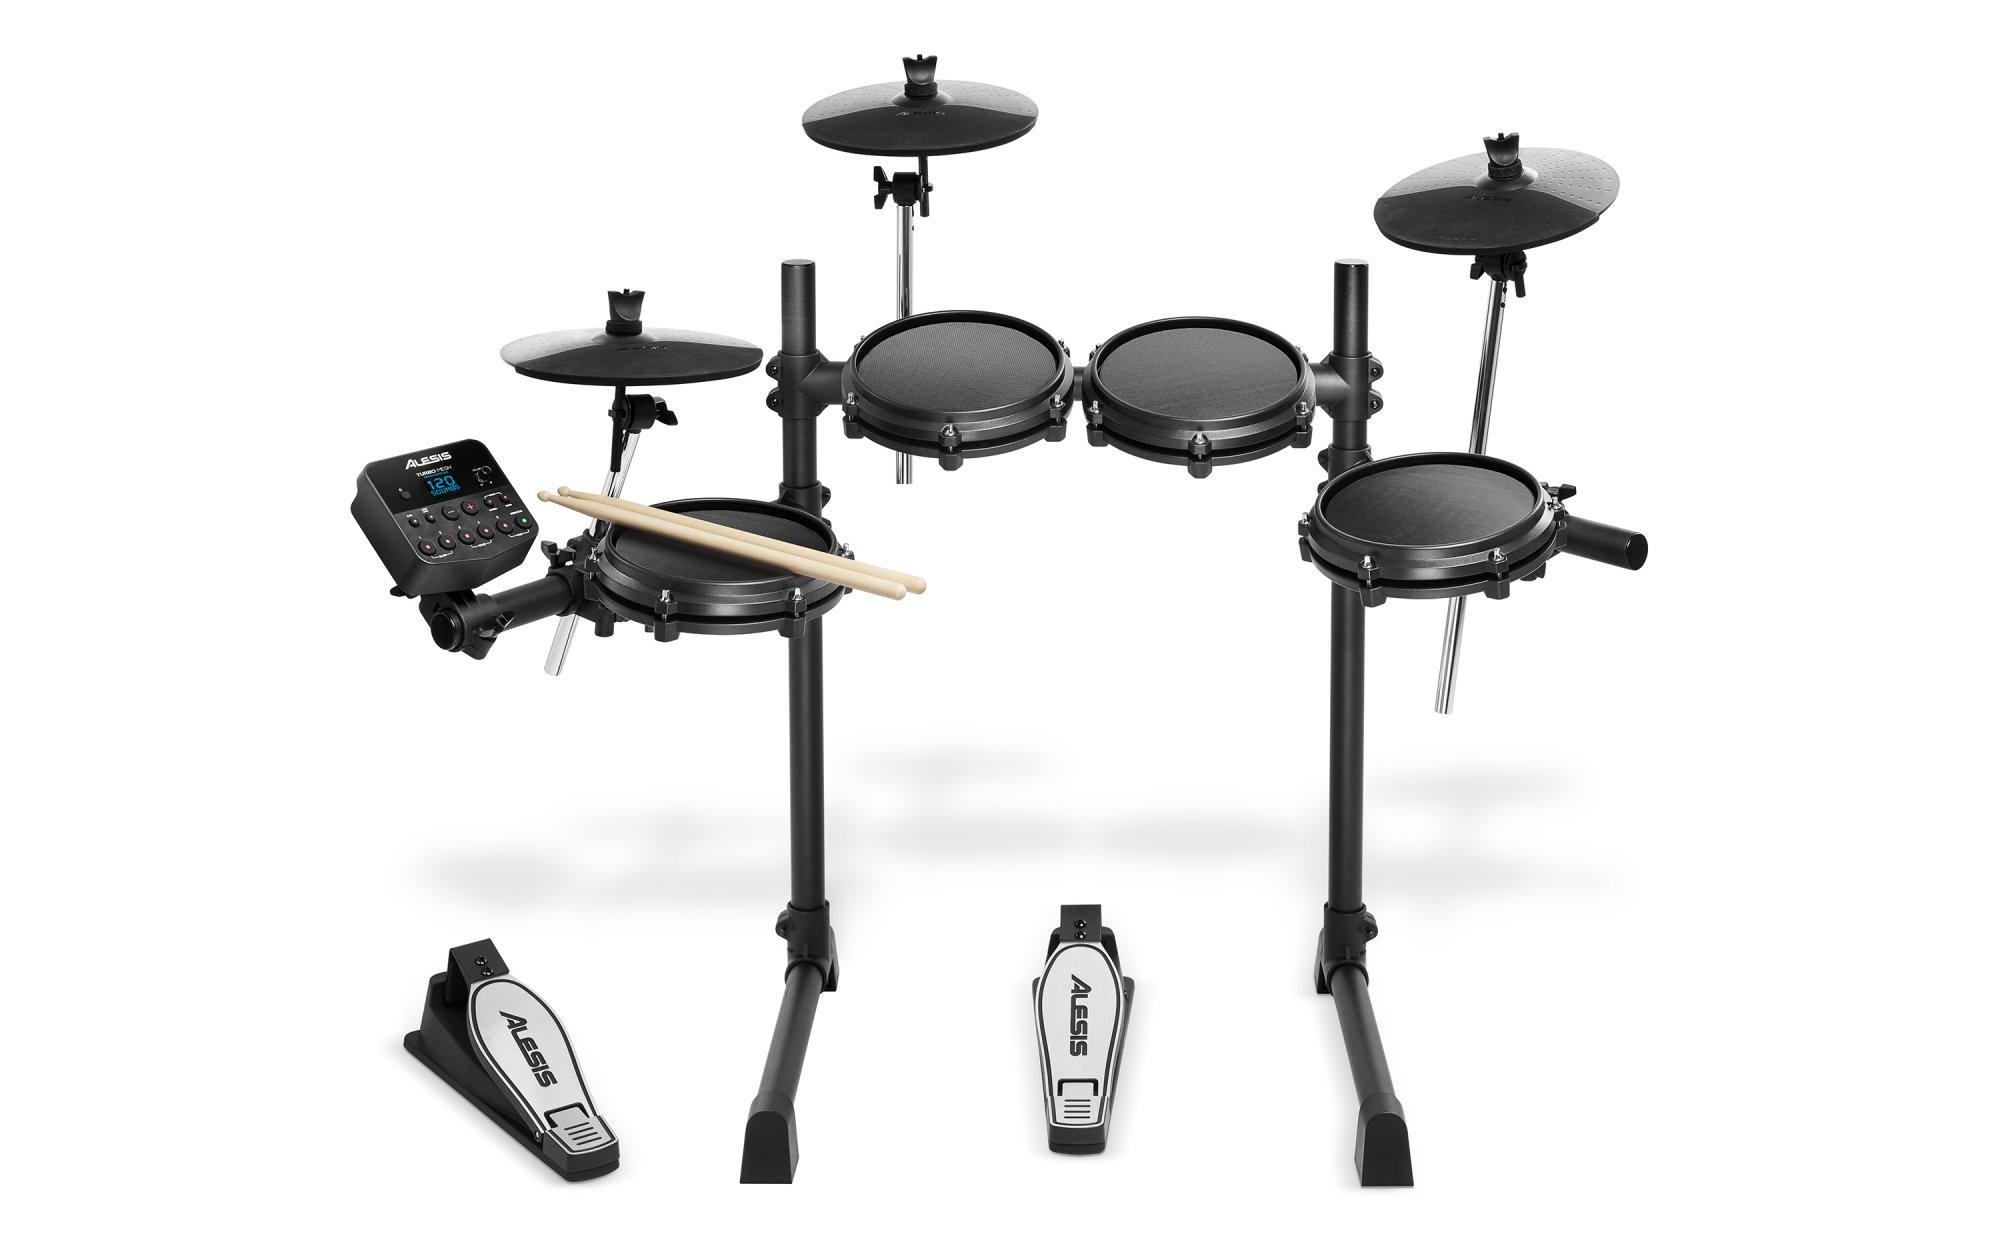 Alesis Turbo Mesh Kit Seven-Piece Electronic Drum Kit with Mesh Heads